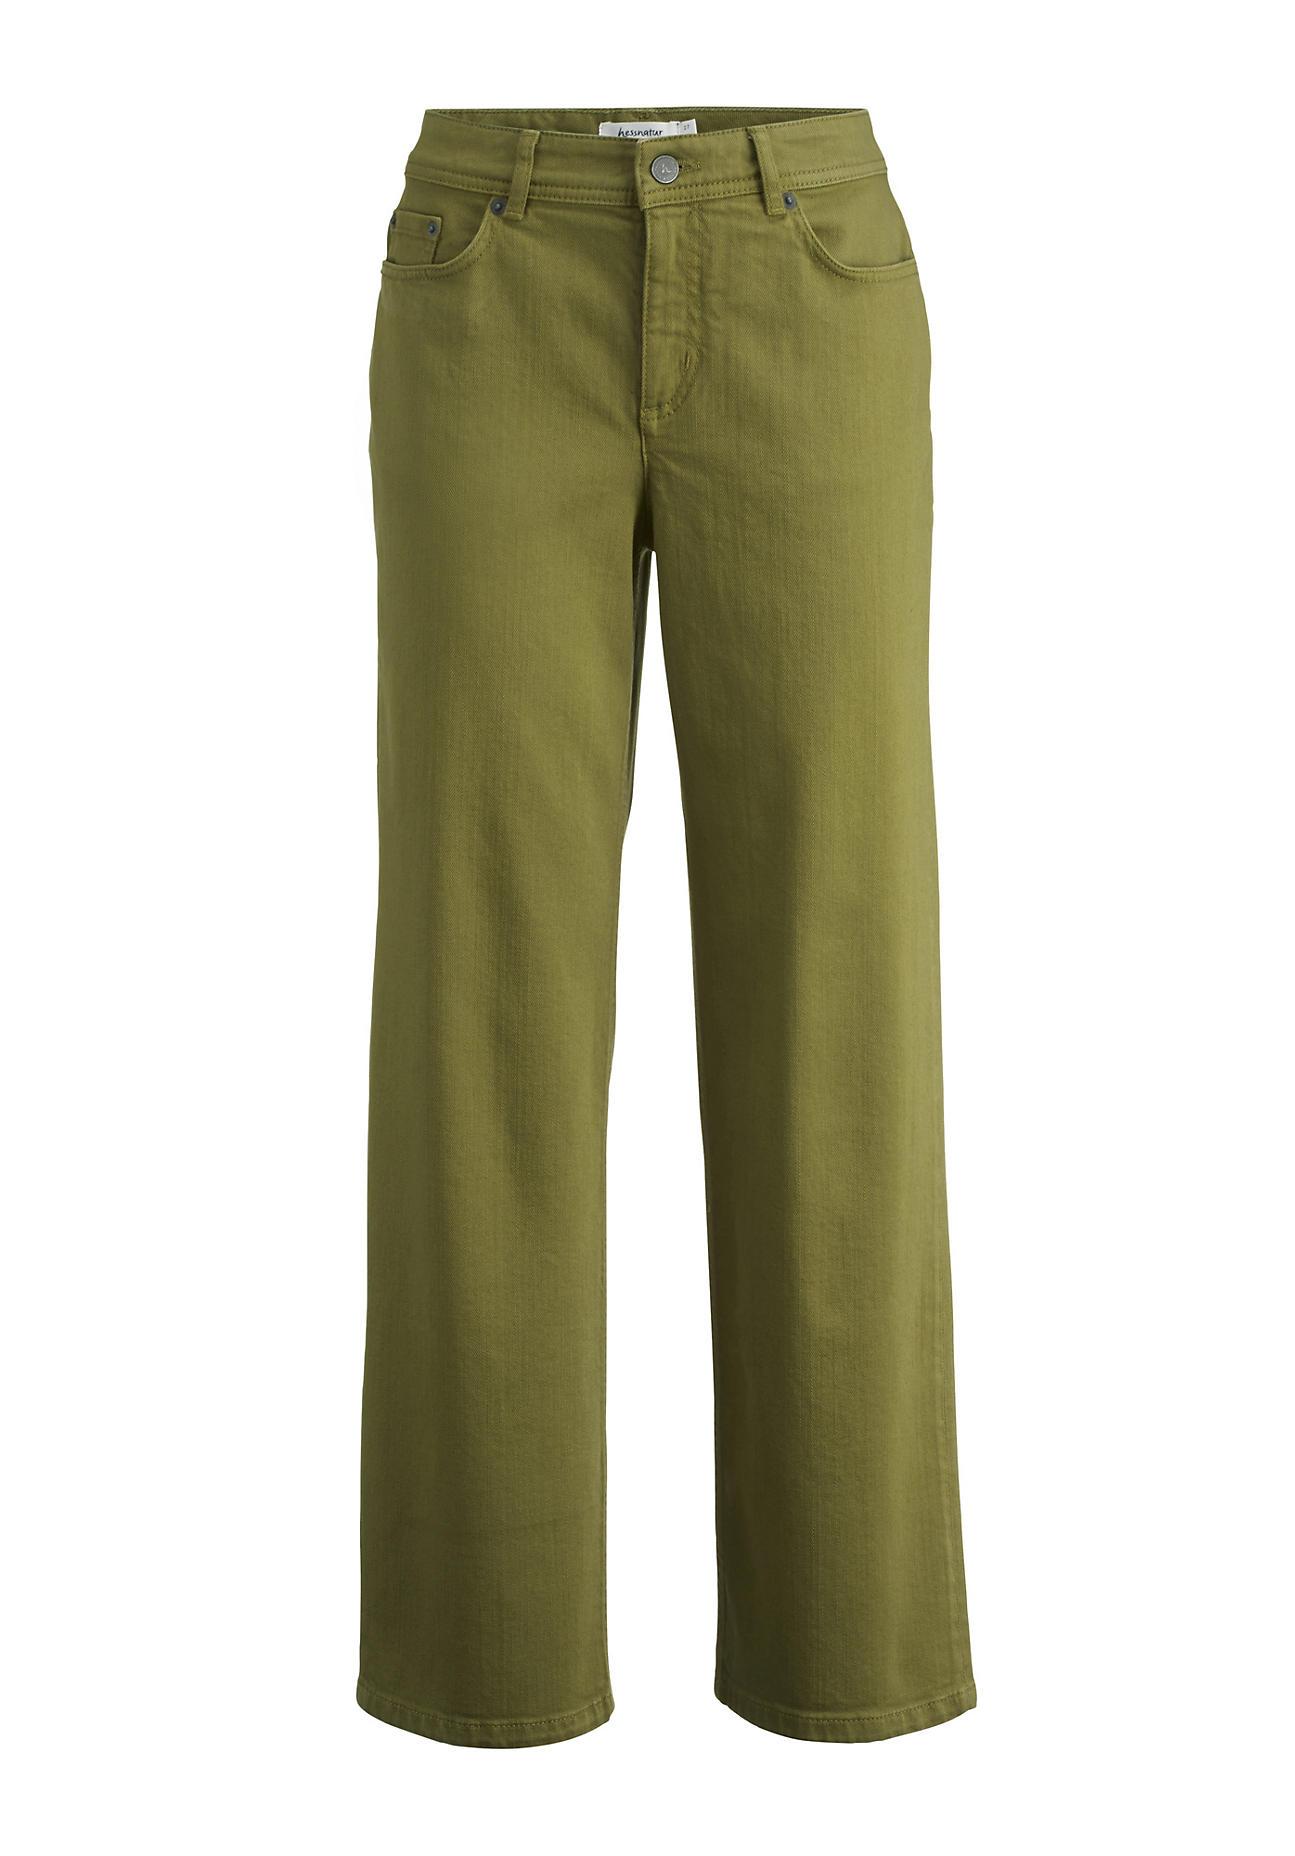 hessnatur Damen Jeans Culotte aus Bio-Denim – grün – Größe 27/32